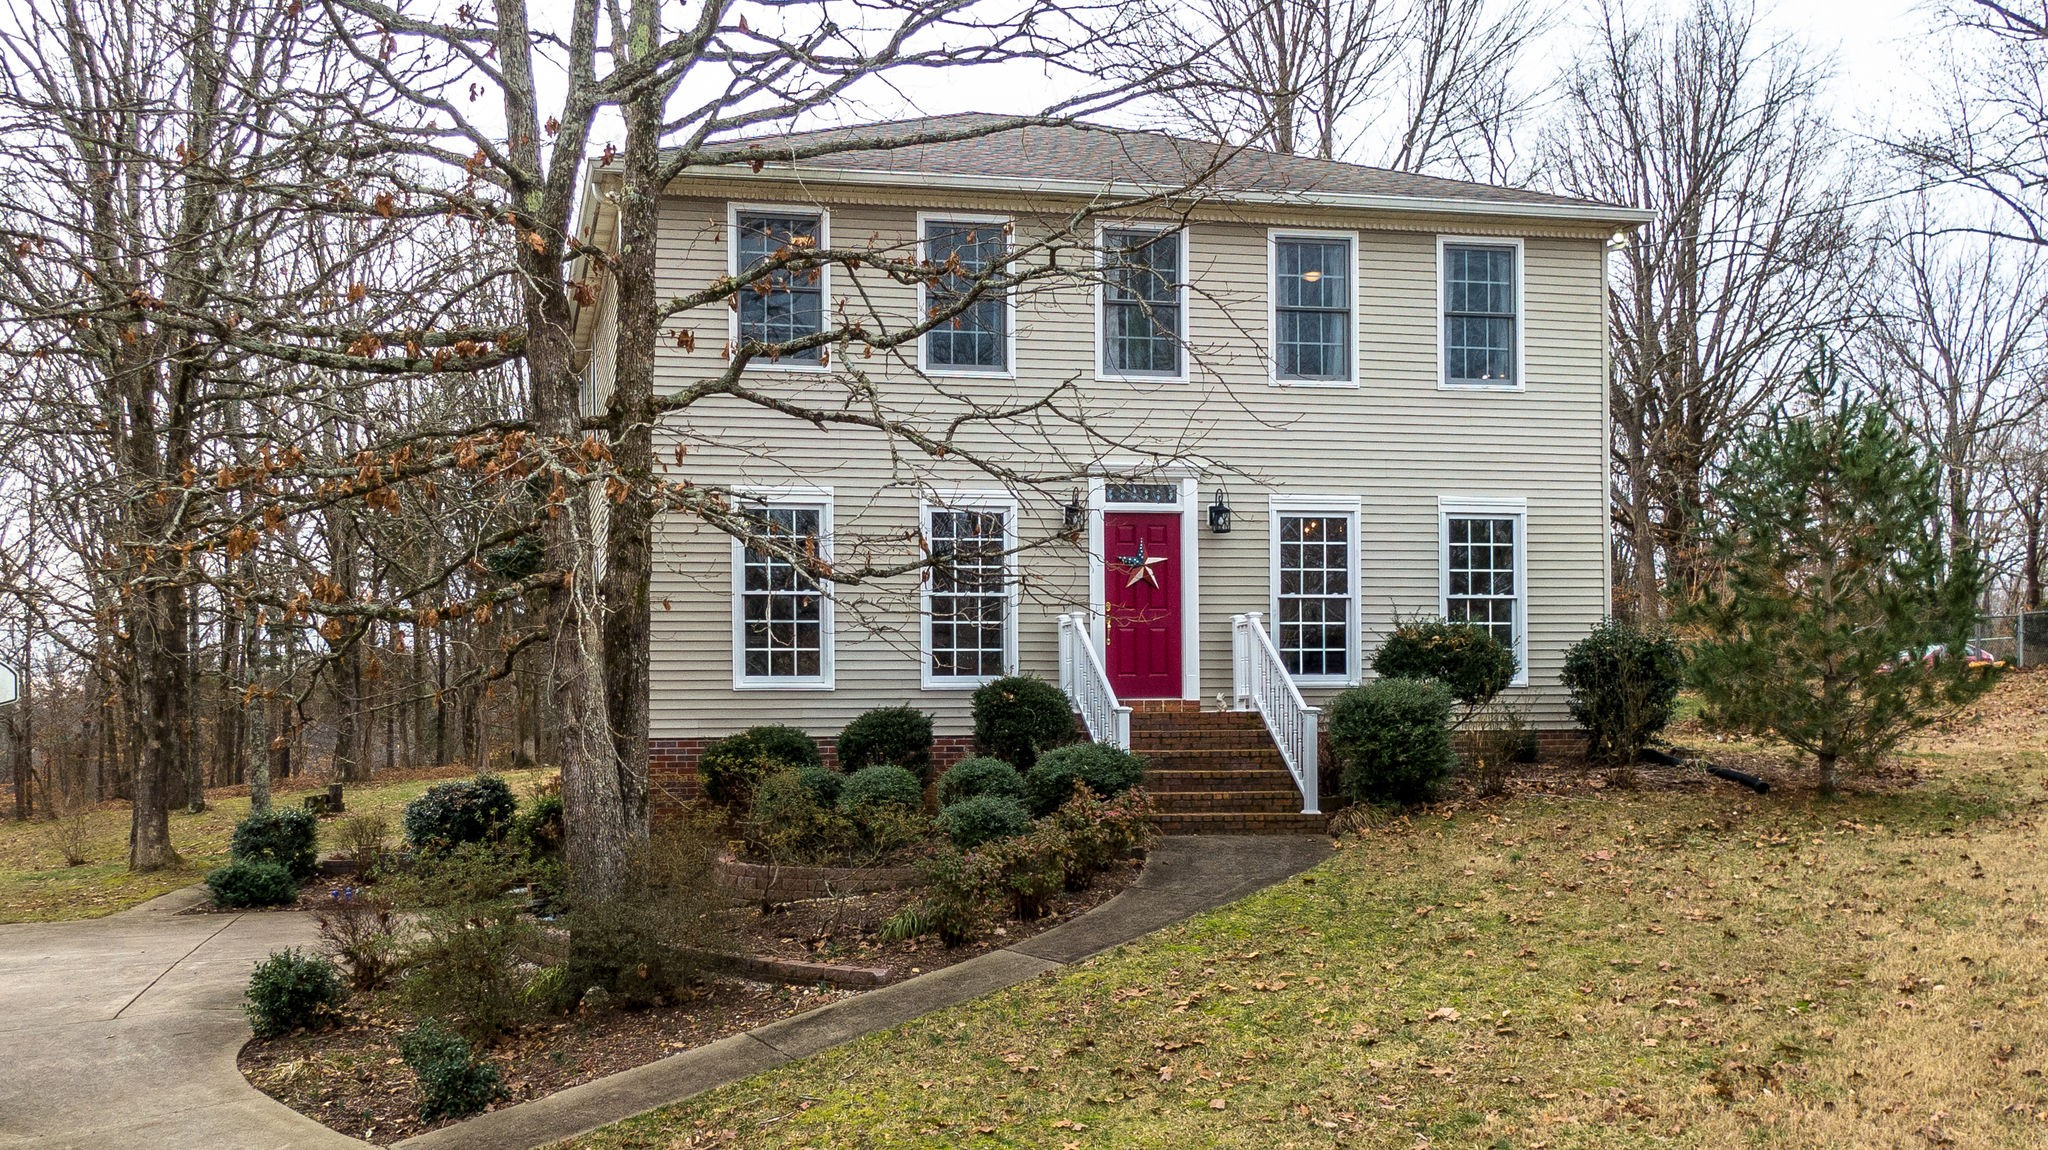 317 Beechwood Dr, Burns, TN 37029 - Burns, TN real estate listing